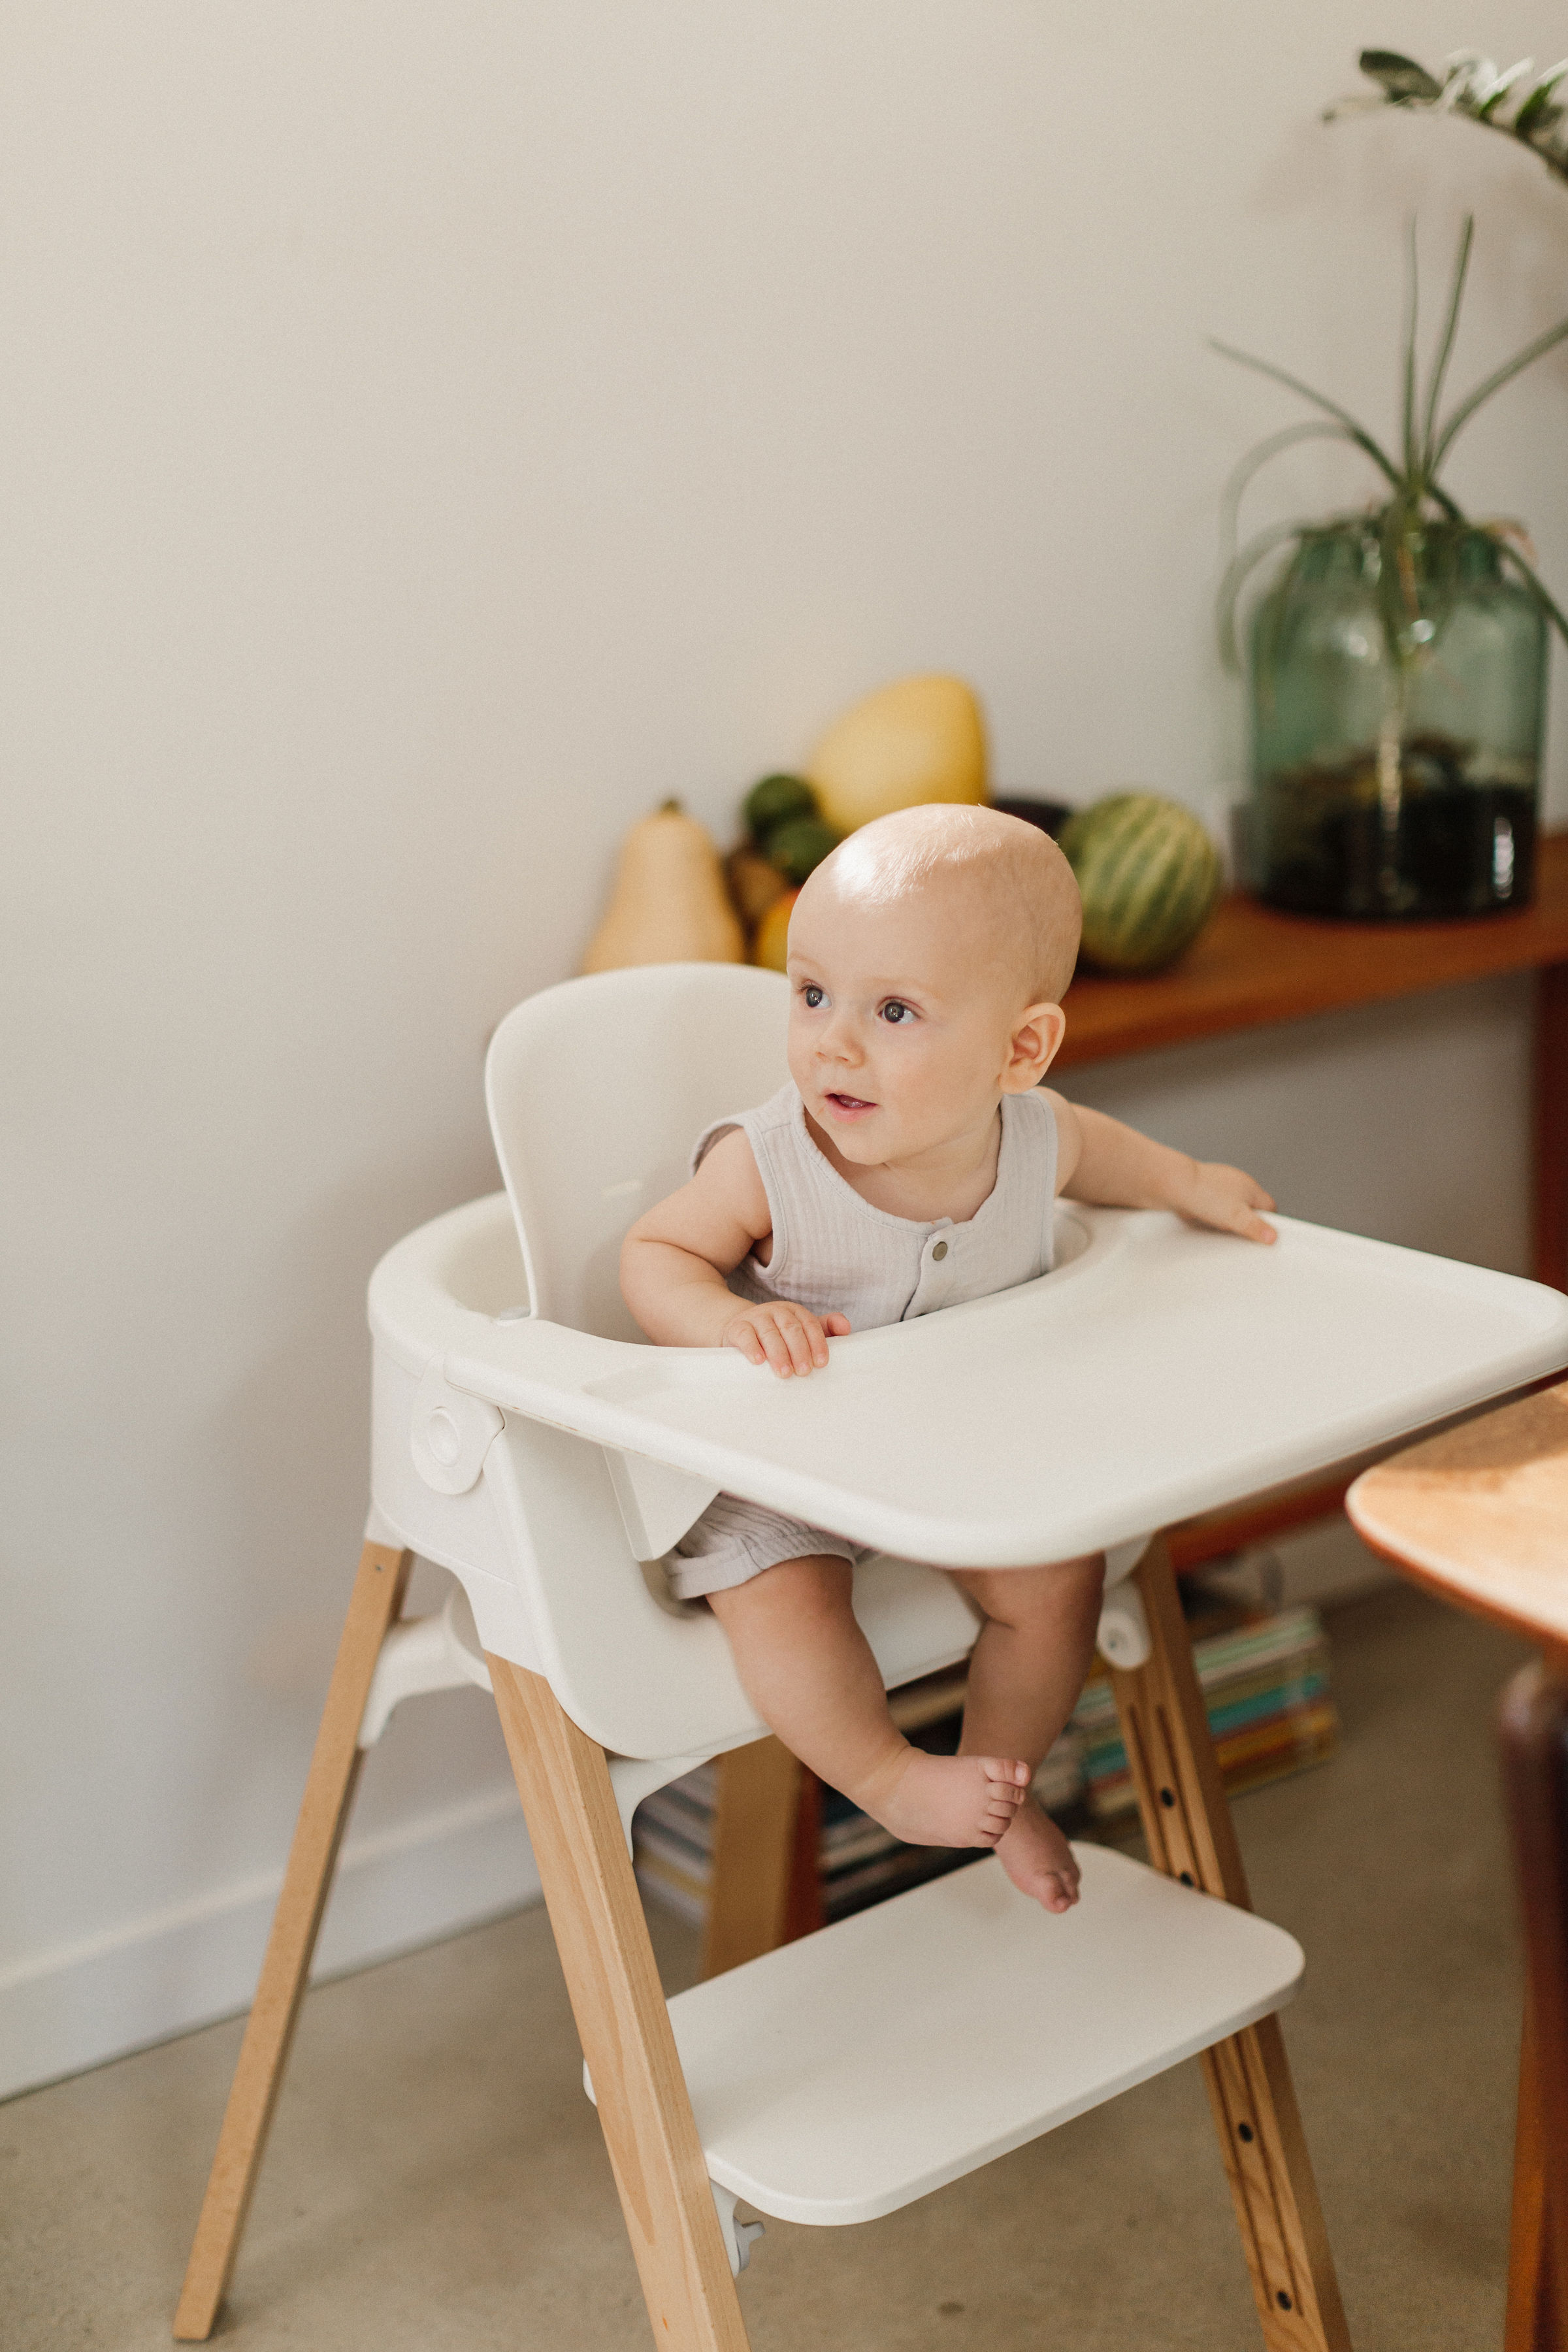 baby-cereal-unhealthy.jpg